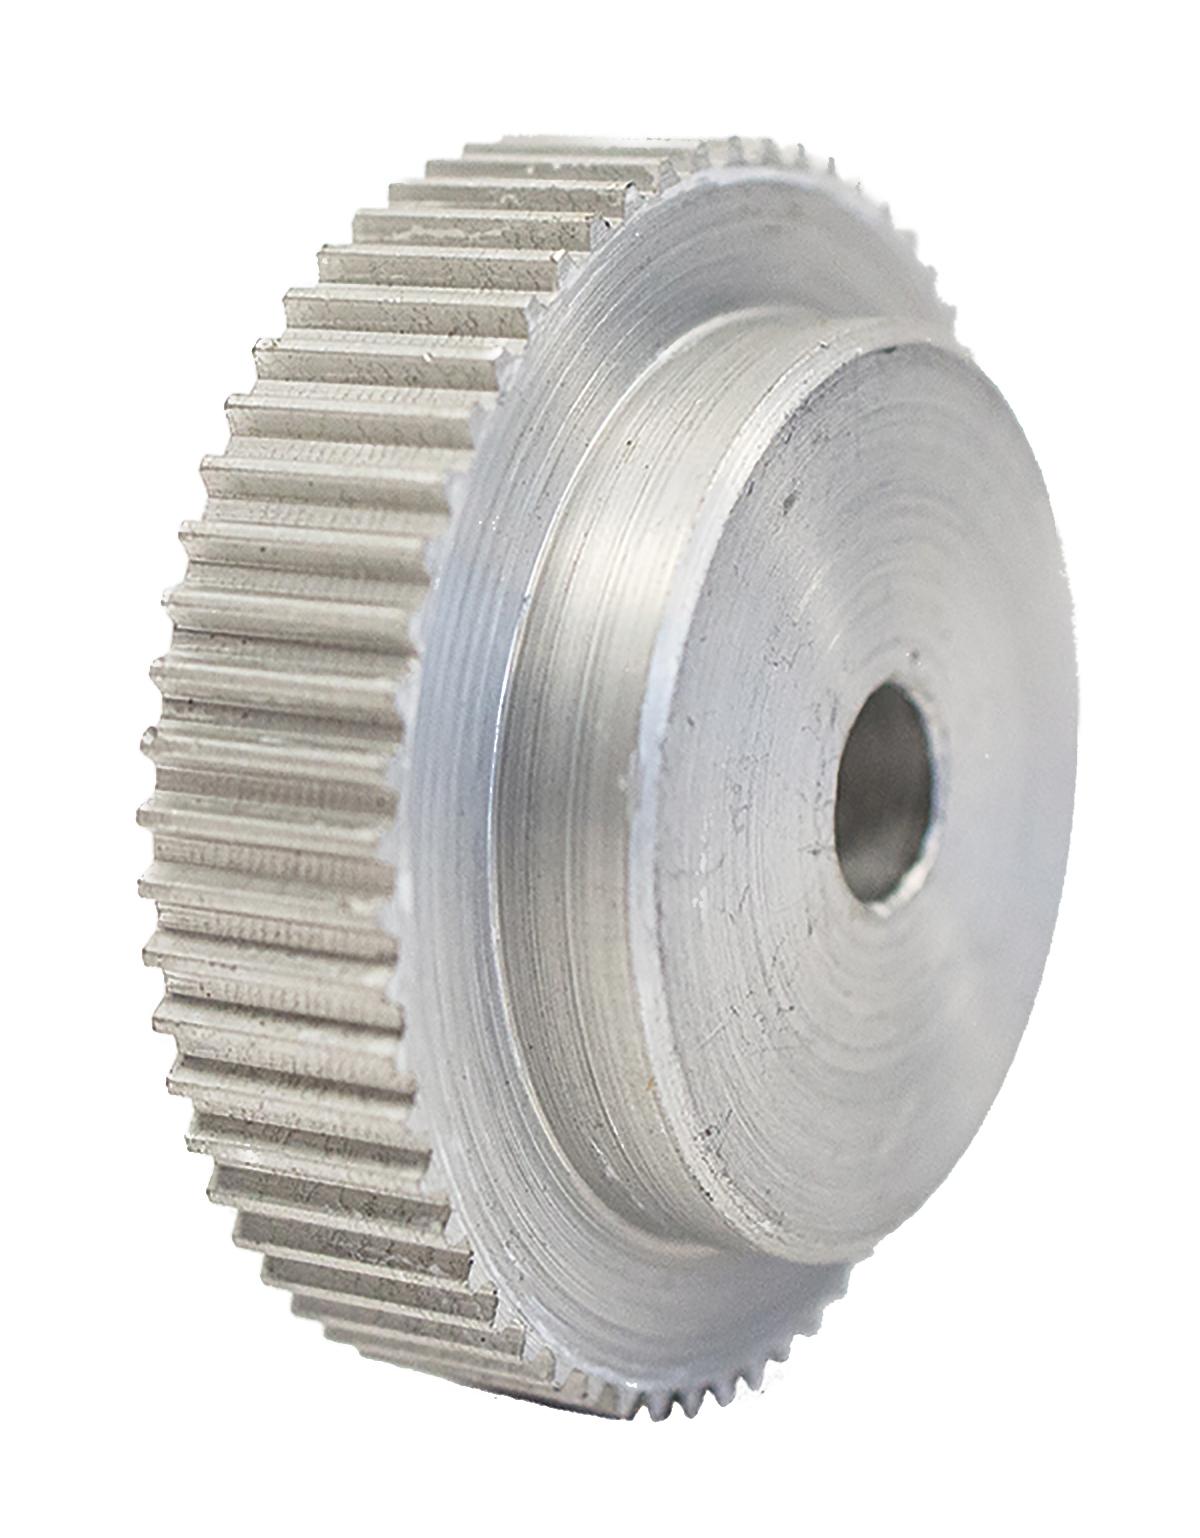 16T2.5/60-0 - Aluminum Metric Pulleys